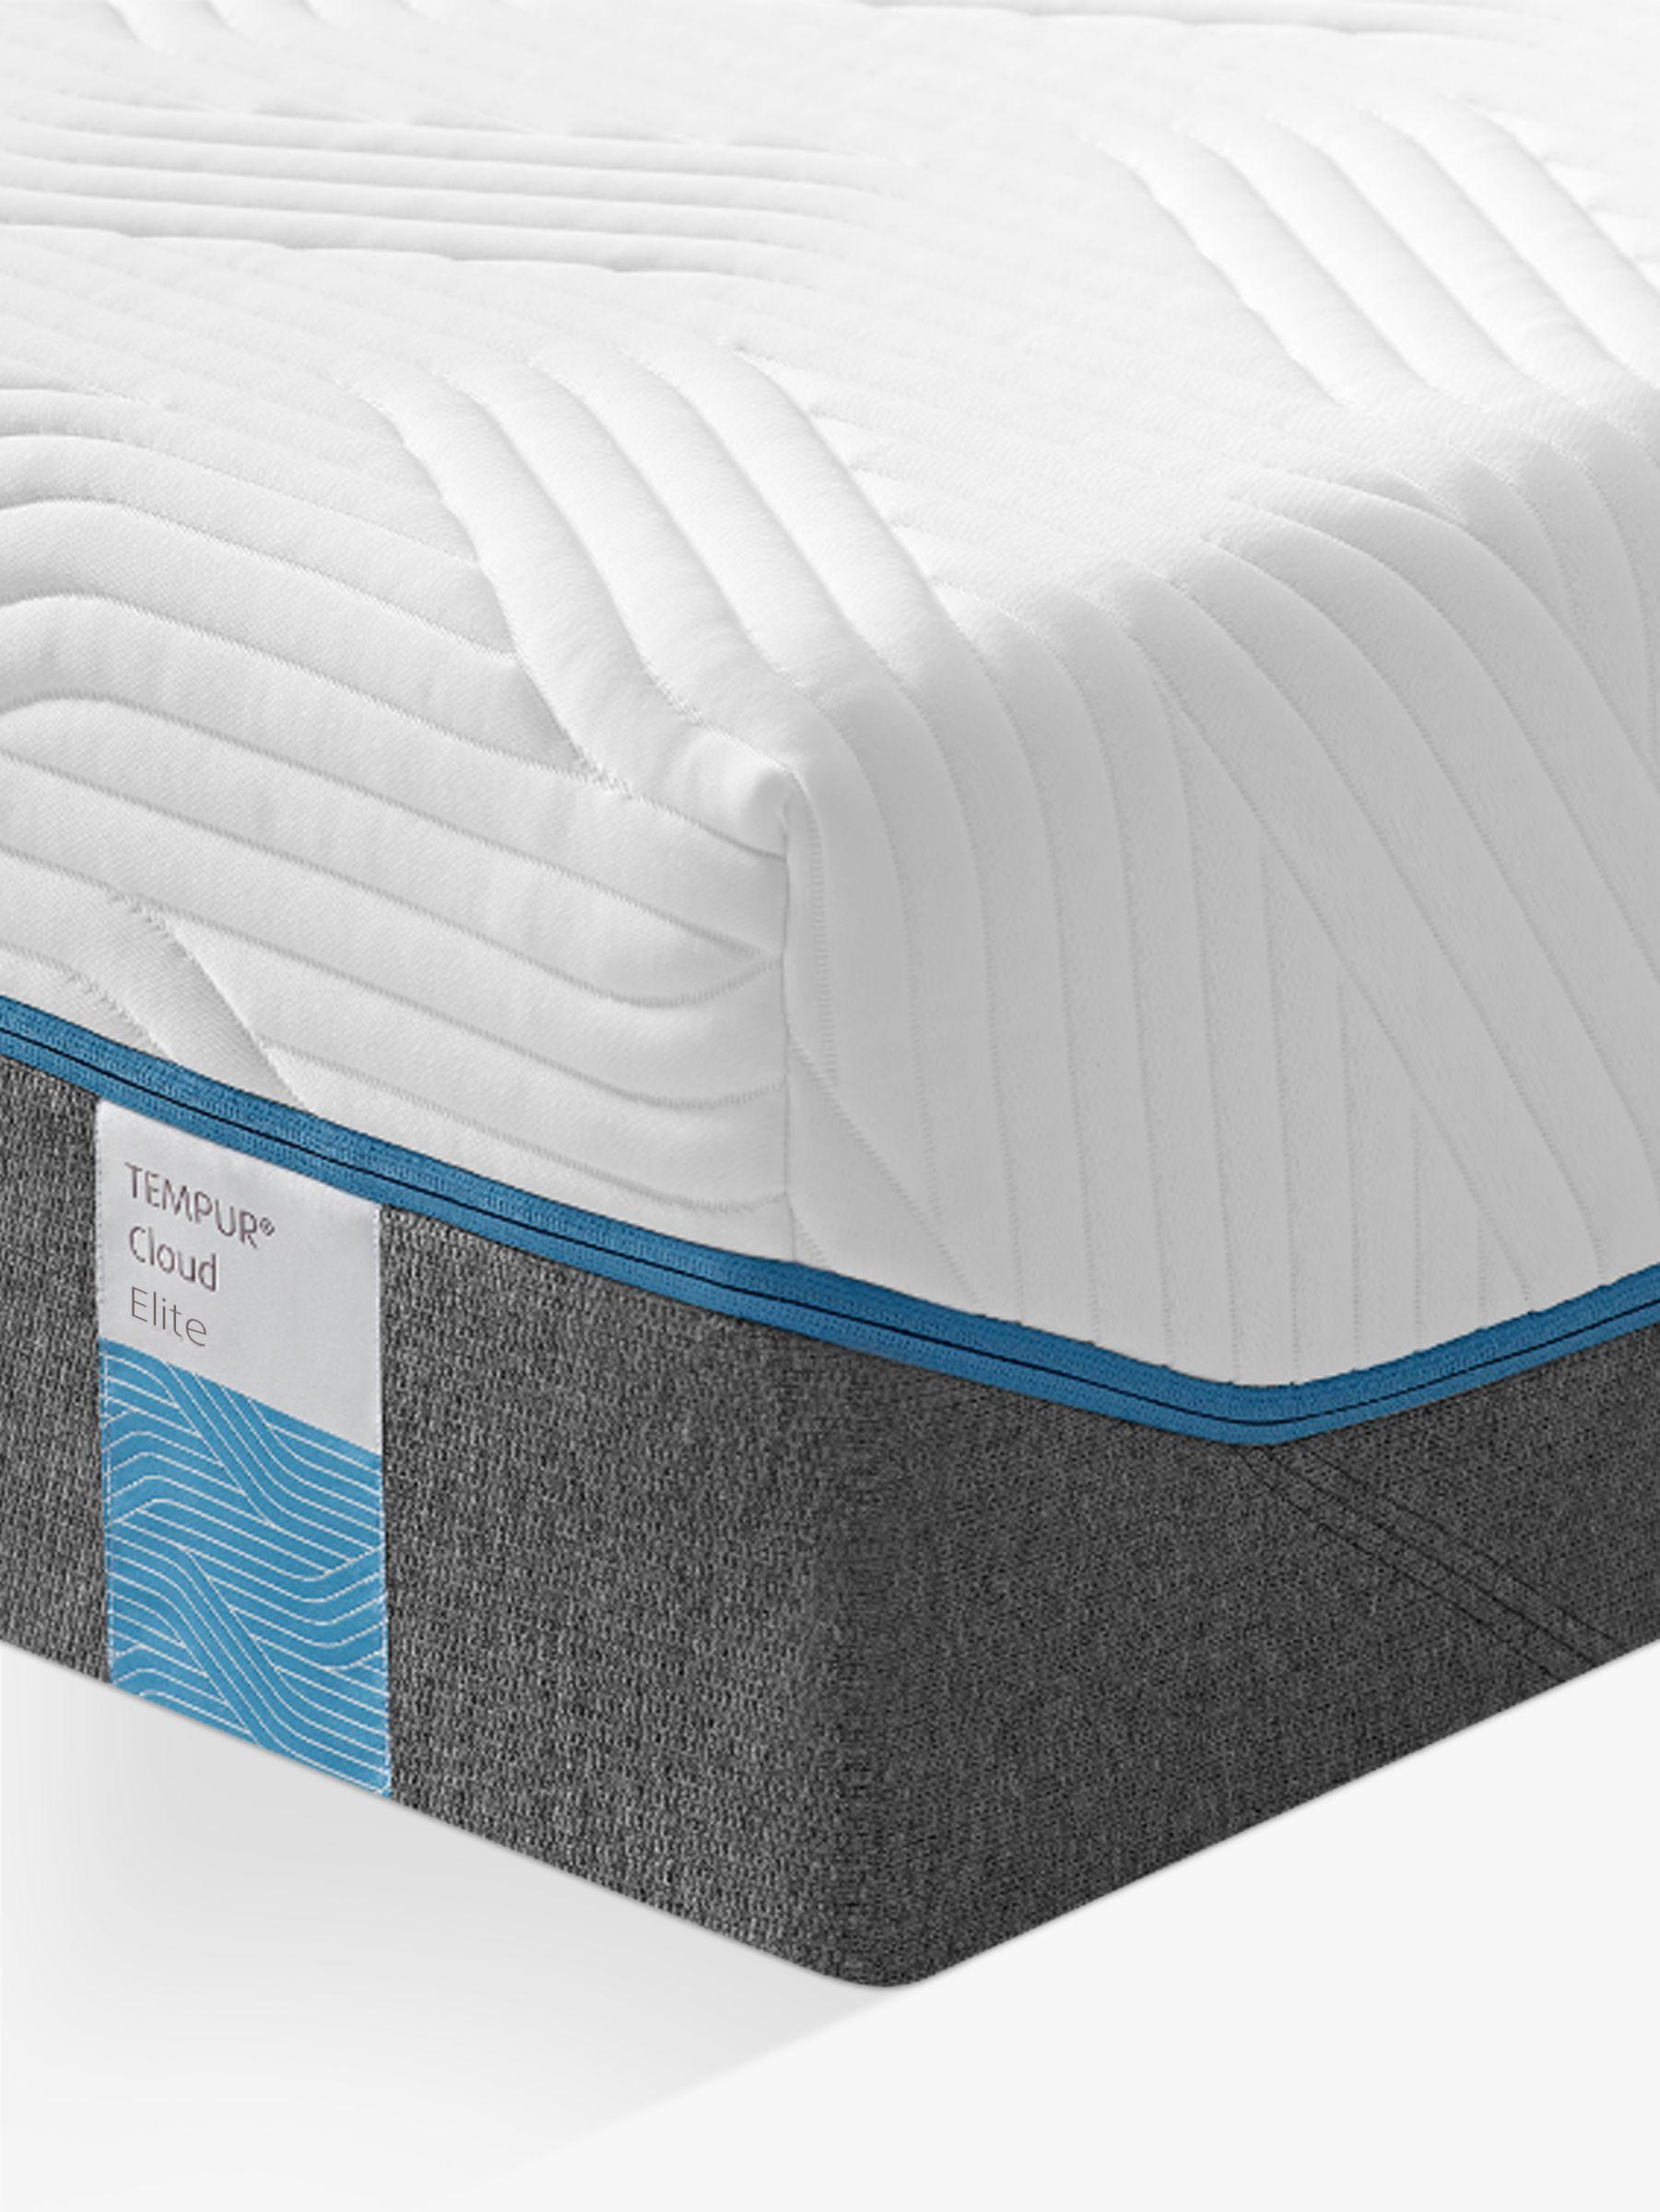 Tempur Tempur Cloud Elite 25 Memory Foam Mattress, Soft, King Size